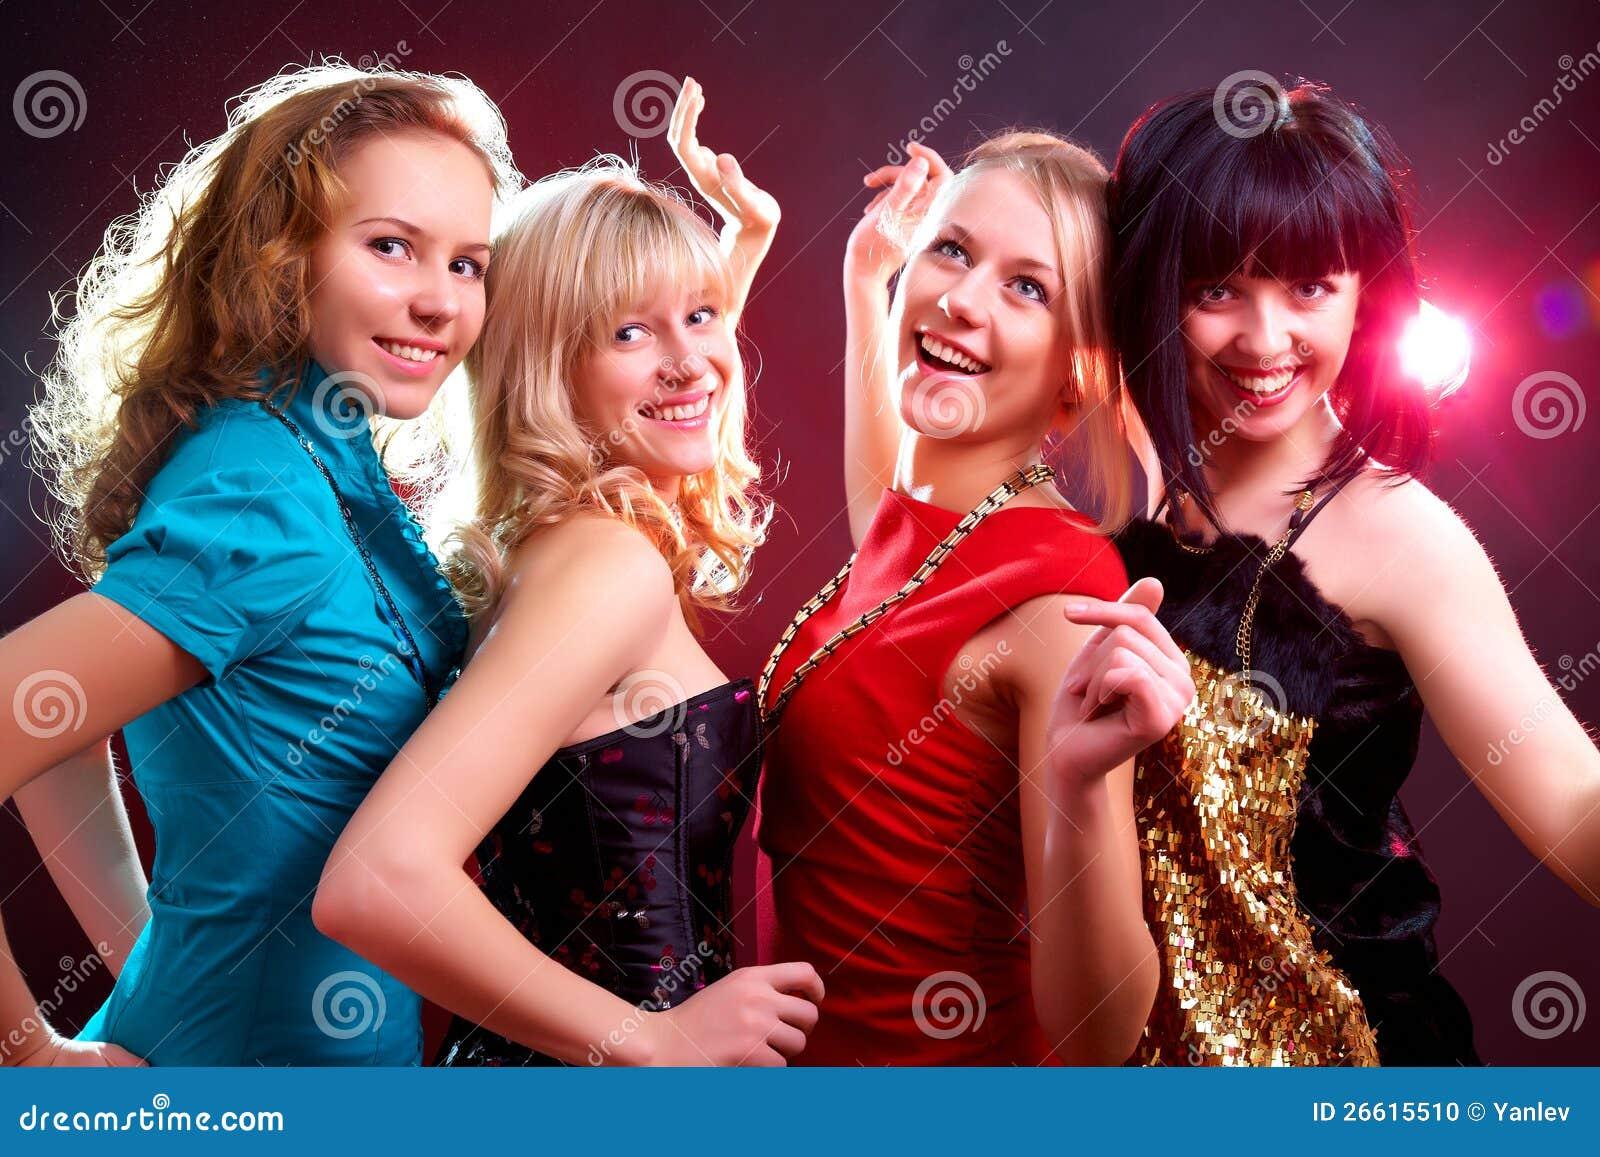 Girls orgy